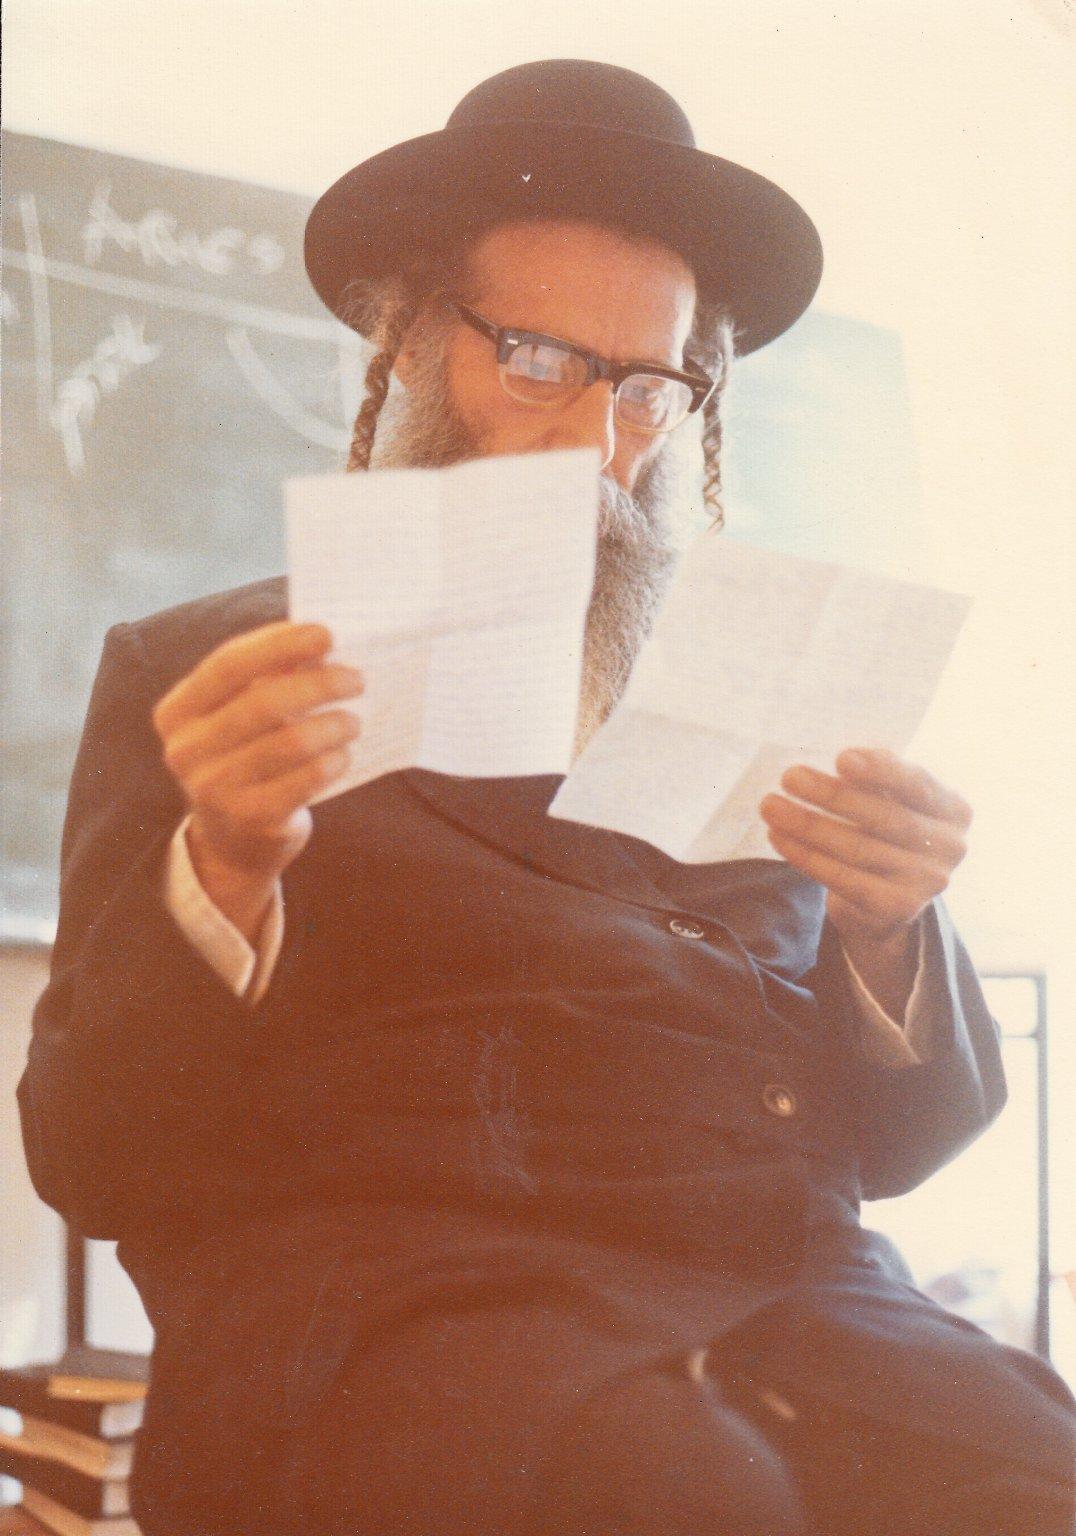 Rabbi Gedaliah Kenig reading notes, 1982.